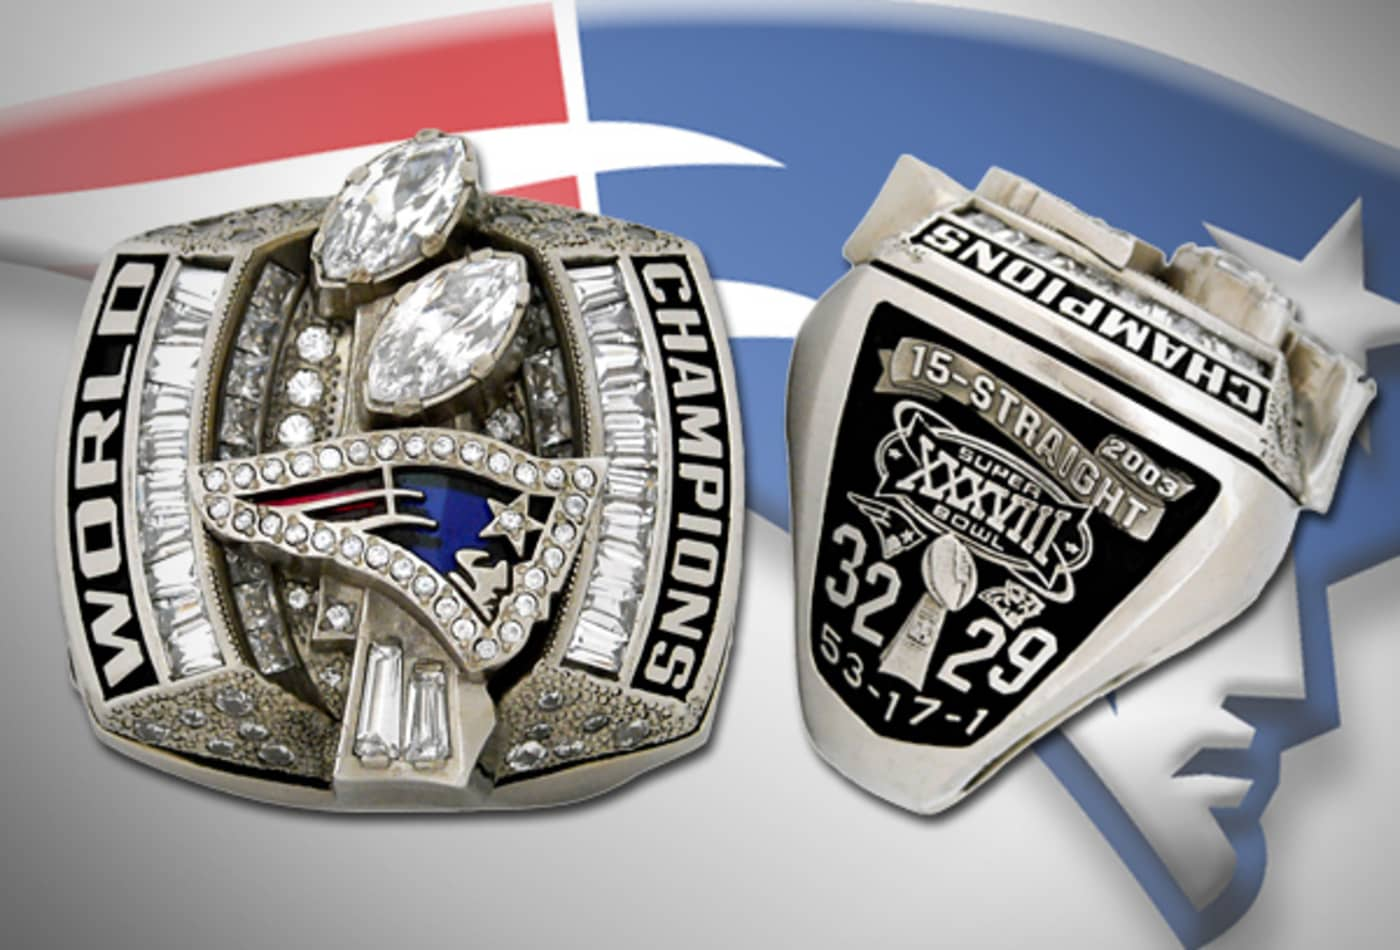 superbowl-rings-2003-new-england-patriots1.jpg